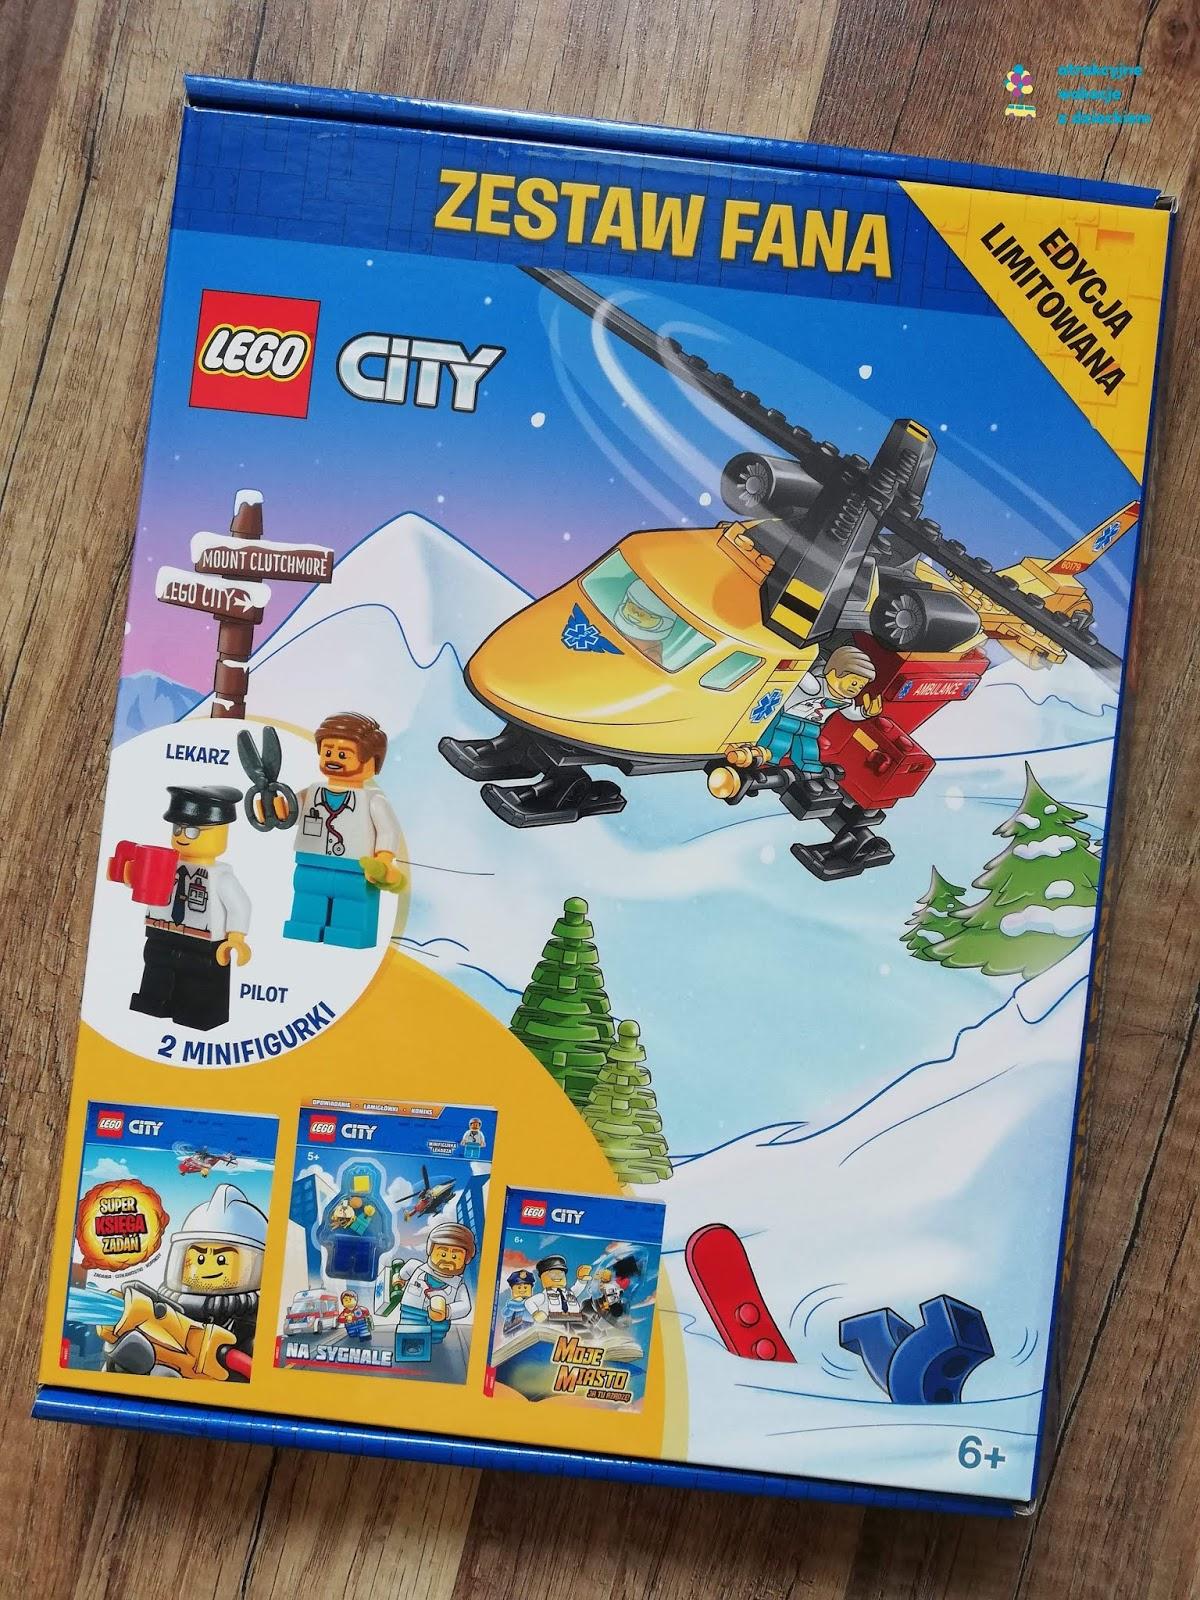 LEGO City lekarz i LEGO City fryzjer